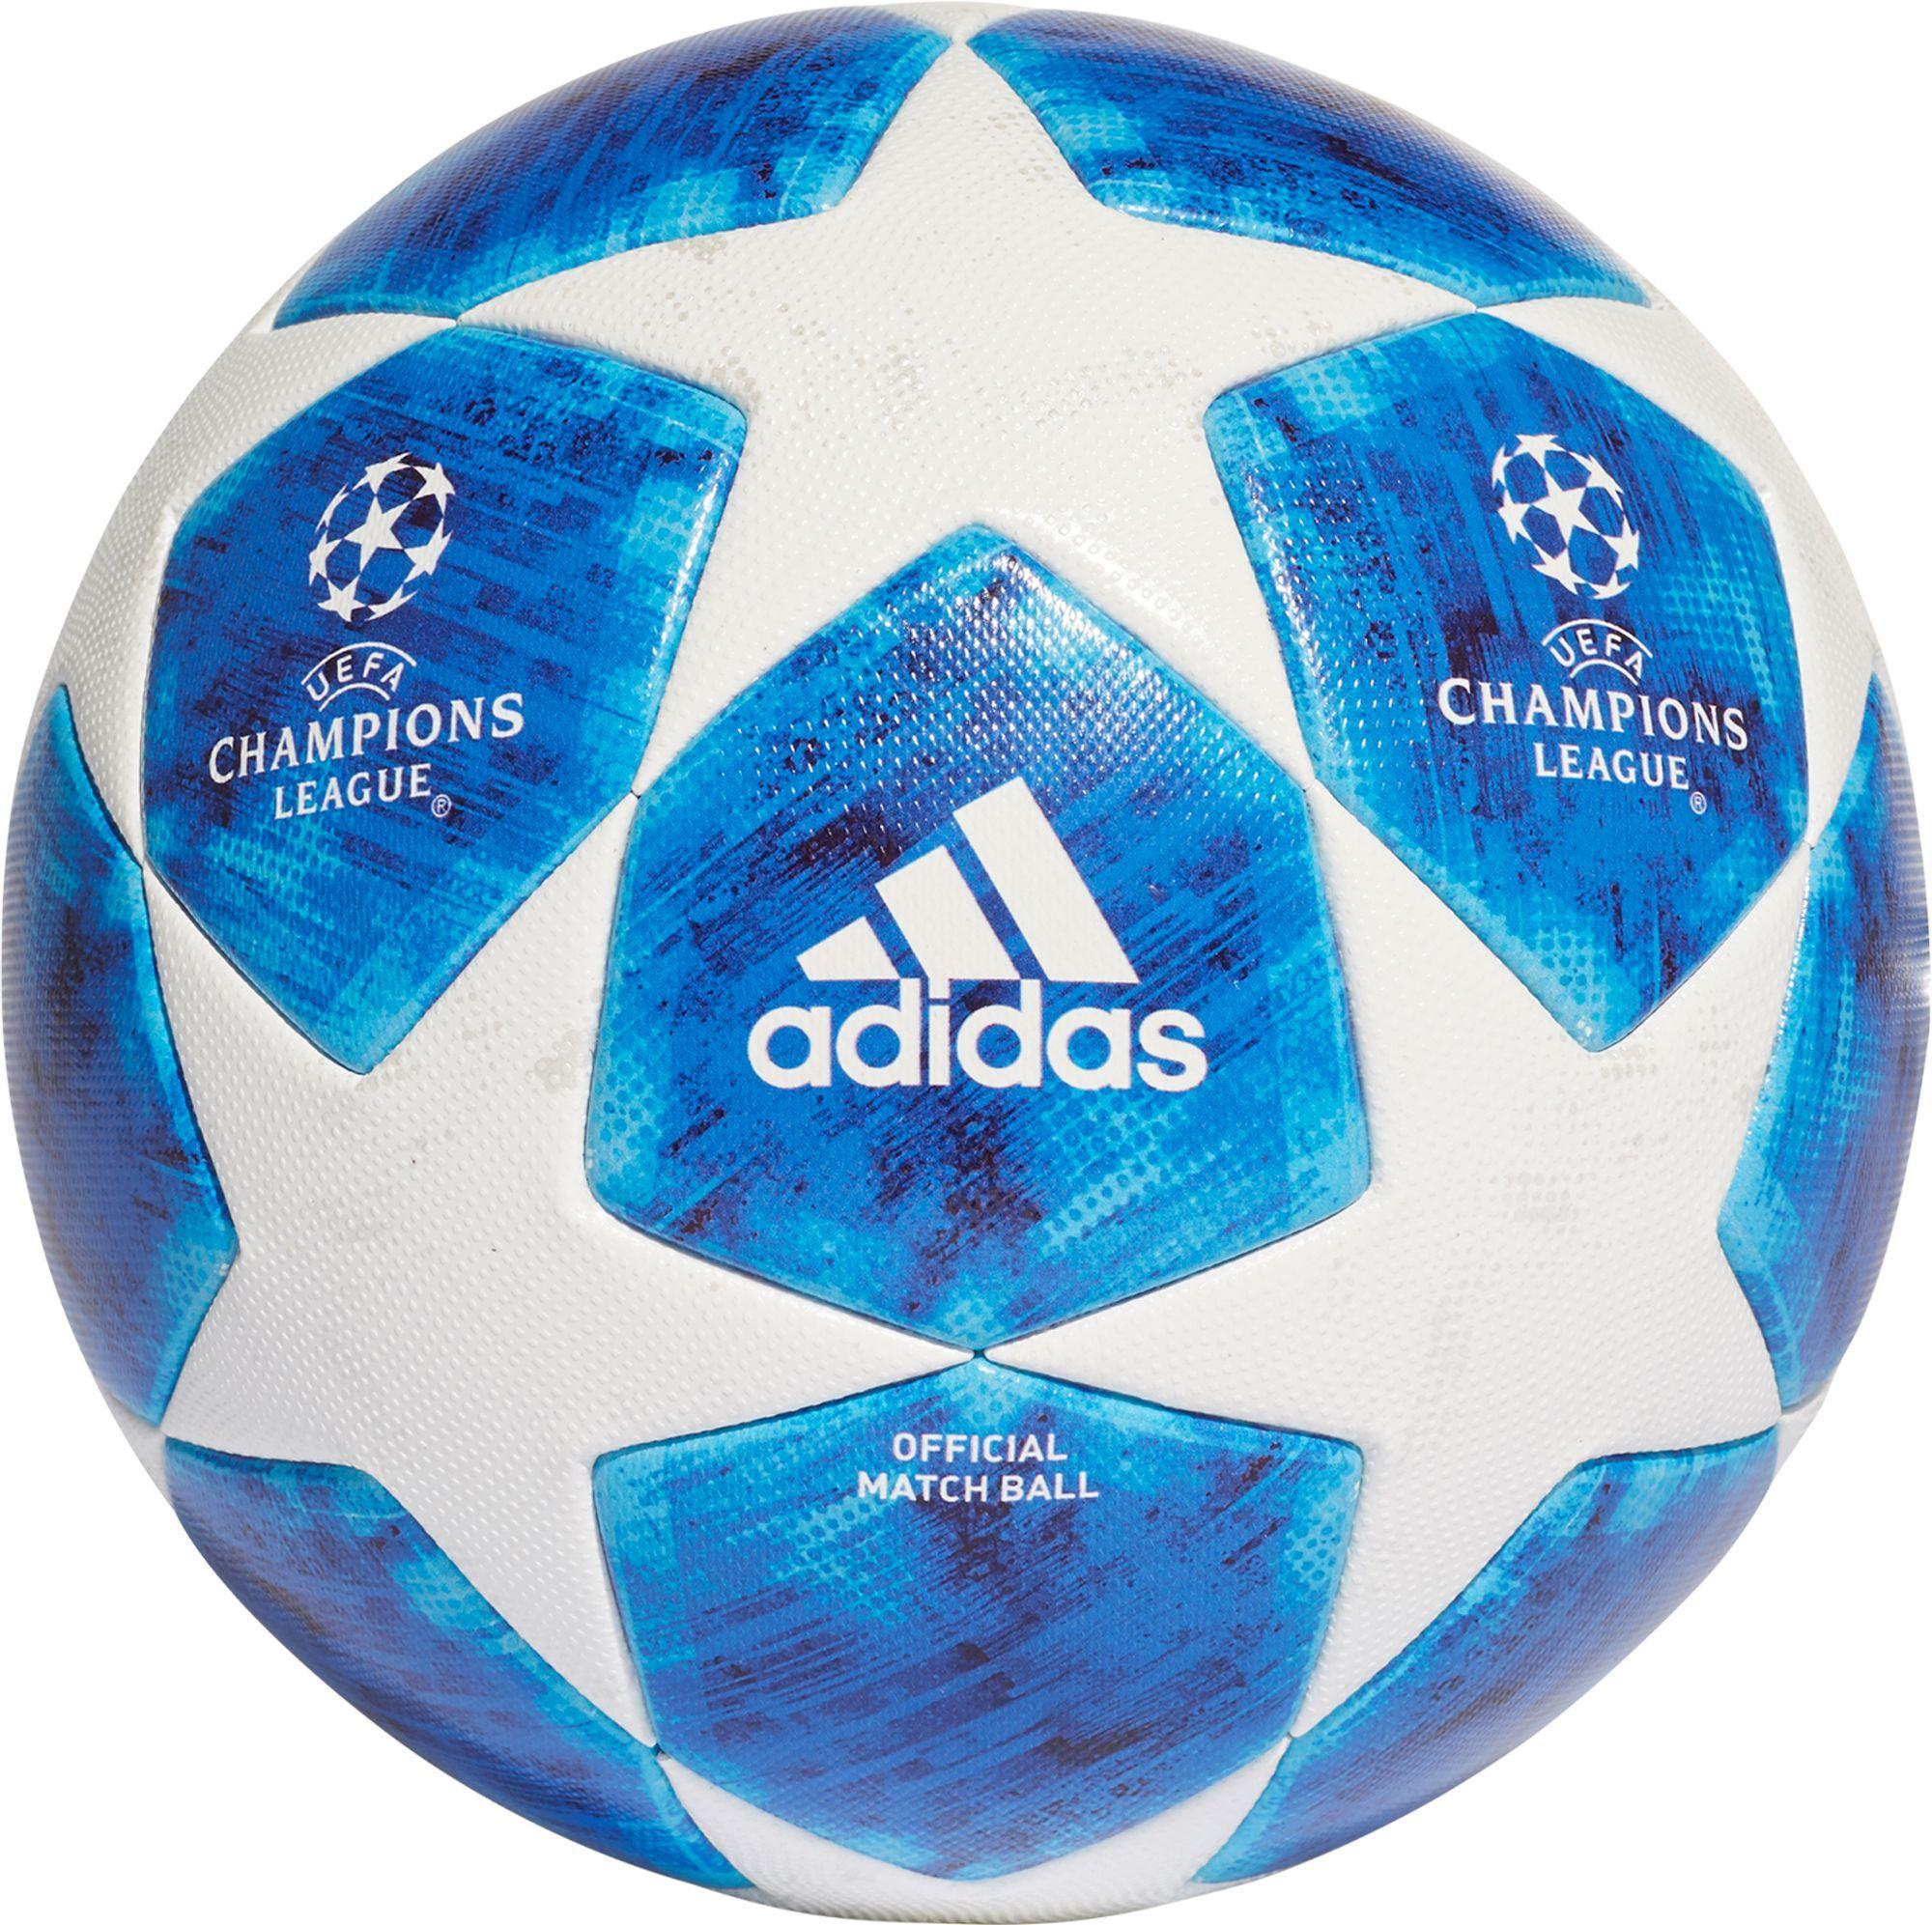 a4a32287c5b12 adidas 2018 Uefa Champions League Finale Official Match Soccer Ball ...